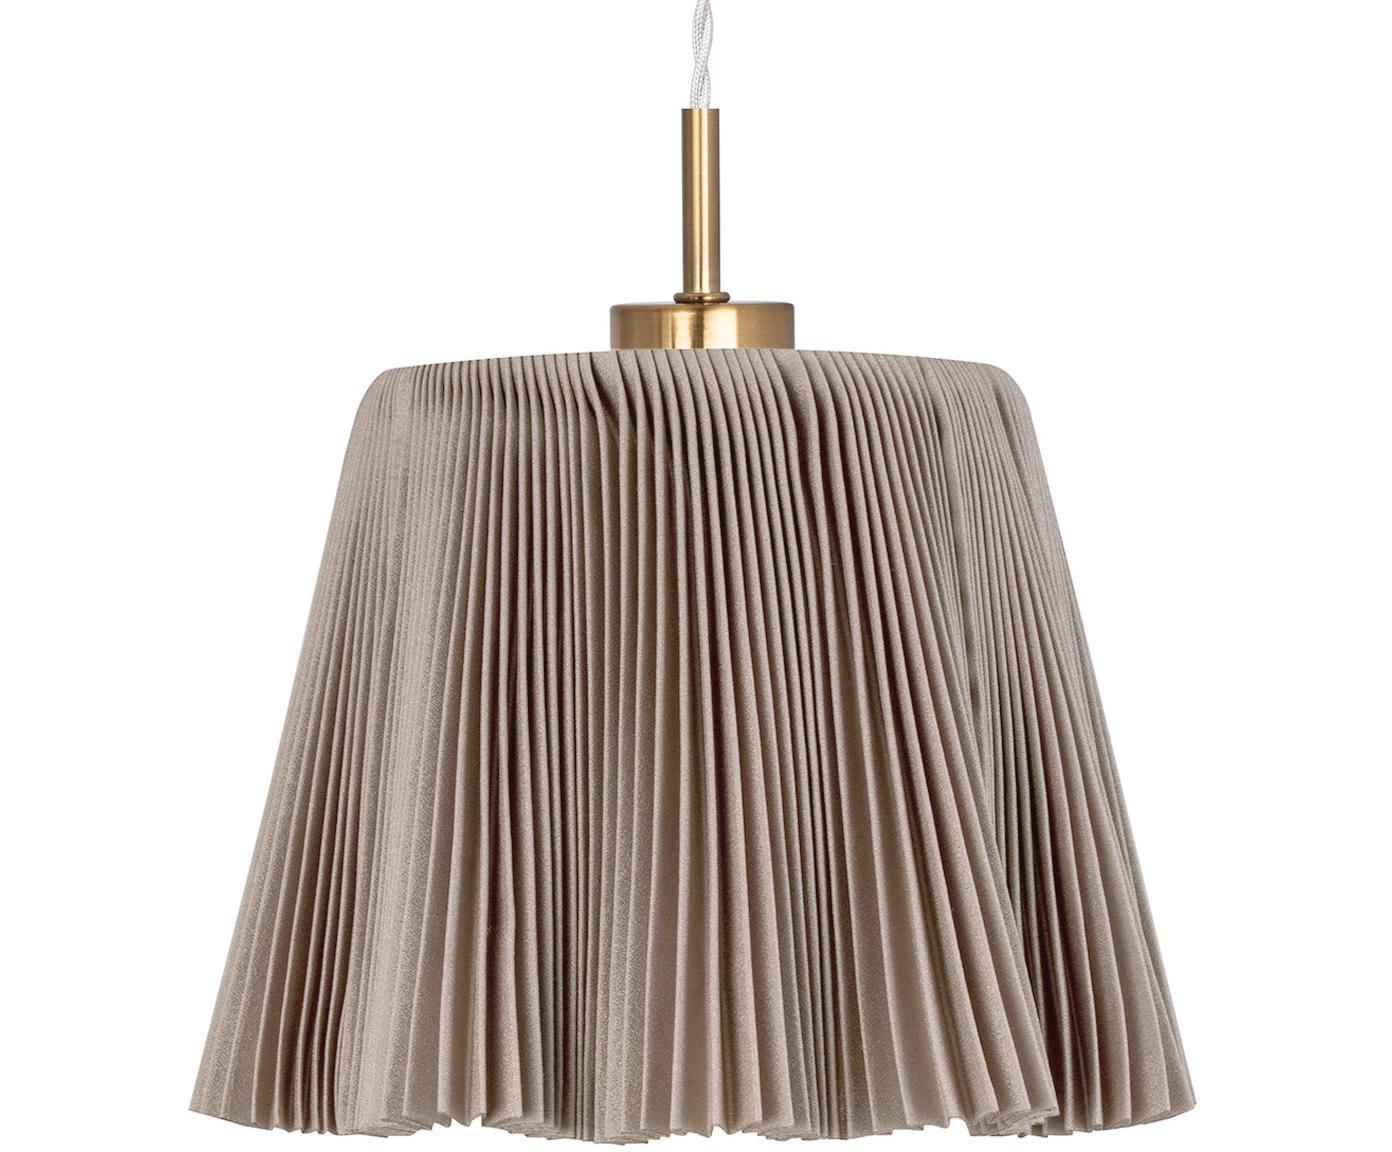 Pendelleuchte Edith aus Faltenstoff, Lampenschirm: Baumwolle, Baldachin: Metall, beschichtet, Braun, Messingfarben, Ø 20 x H 25 cm